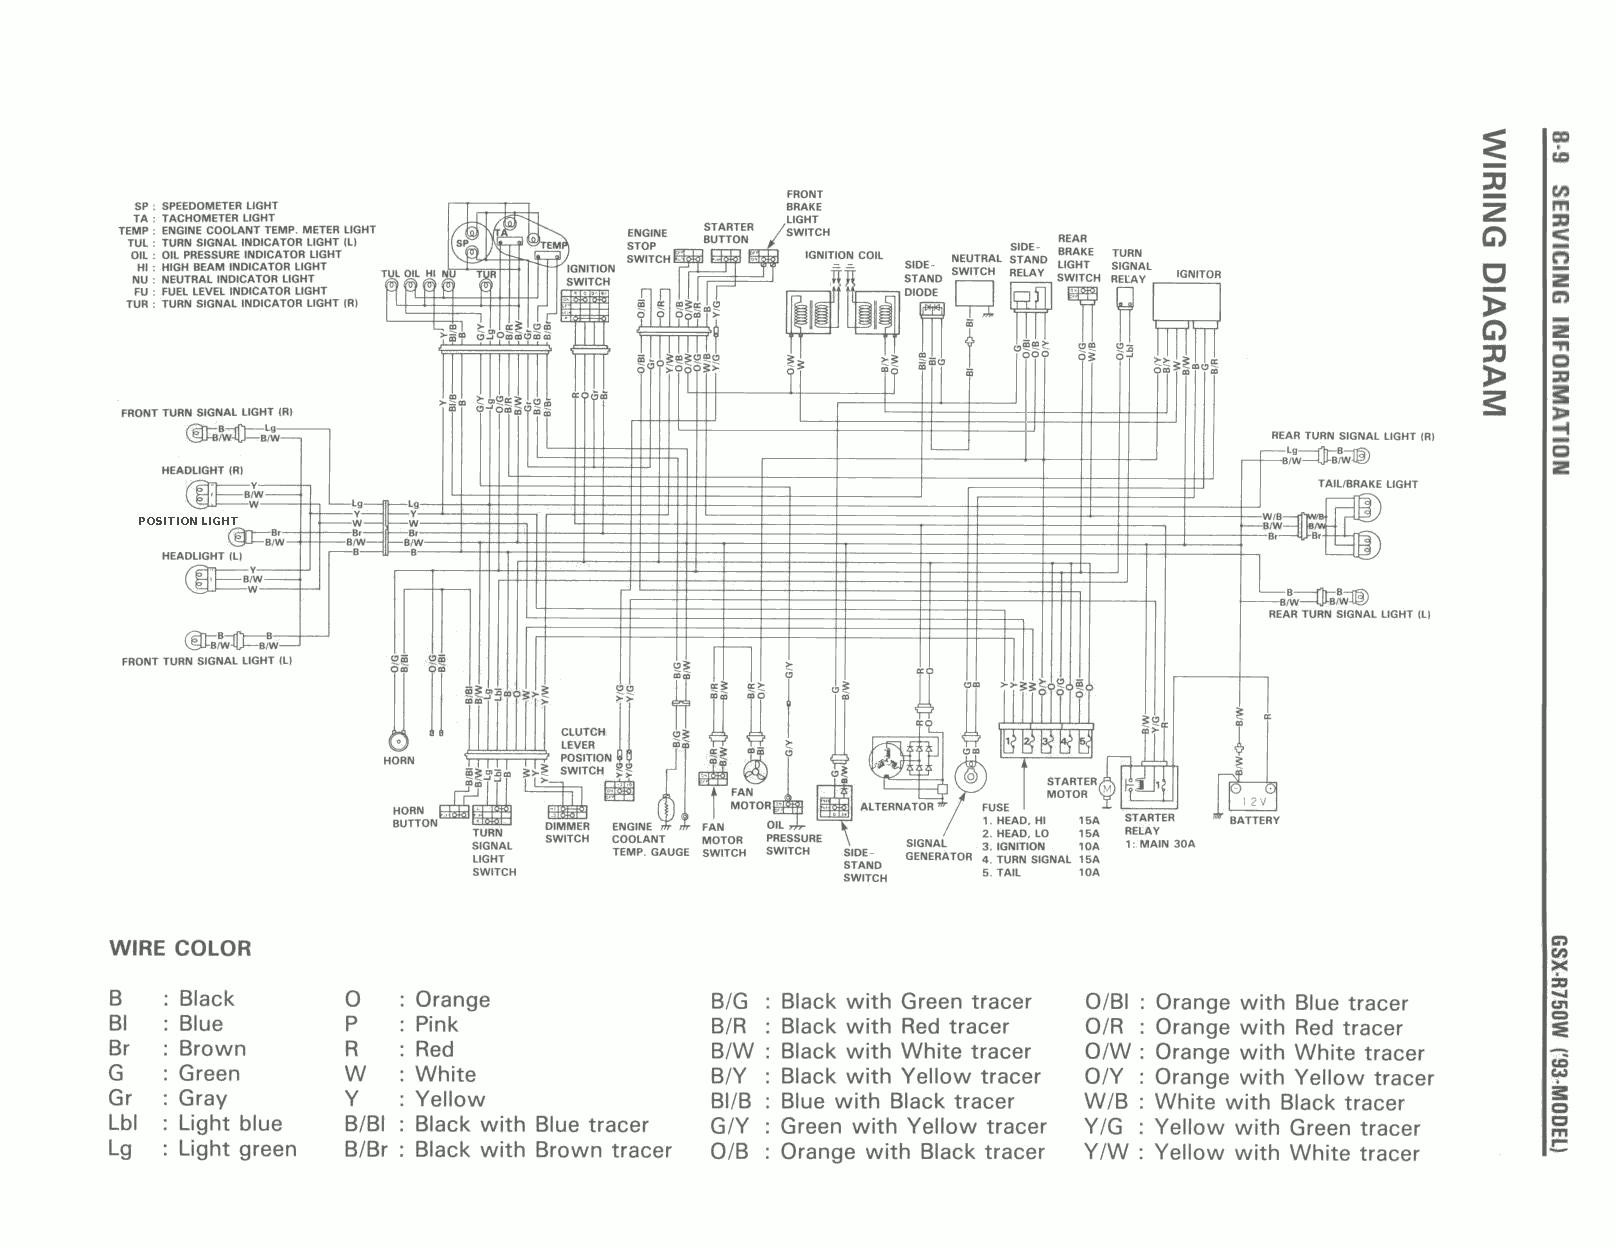 05 Gsxr 1000 Wiring Diagram Another Blog About 2005 Kia Sorento Color K 6 Schematics Rh Enr Green Com